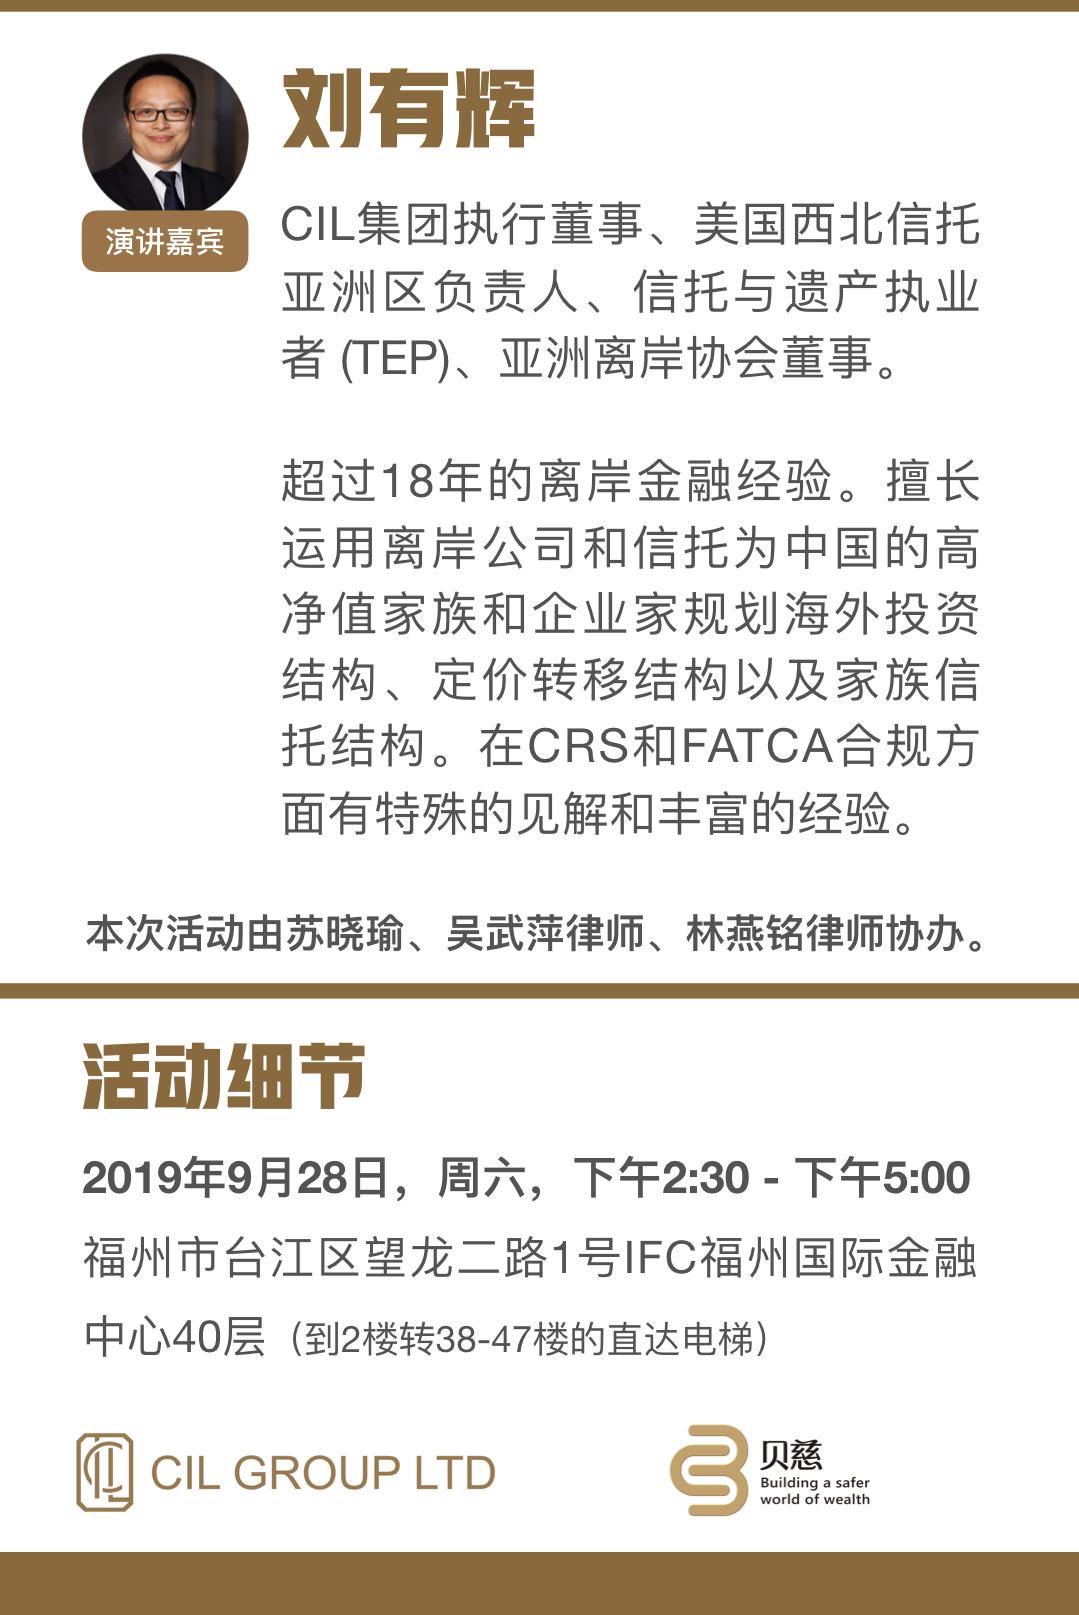 fuzhou.001.jpeg